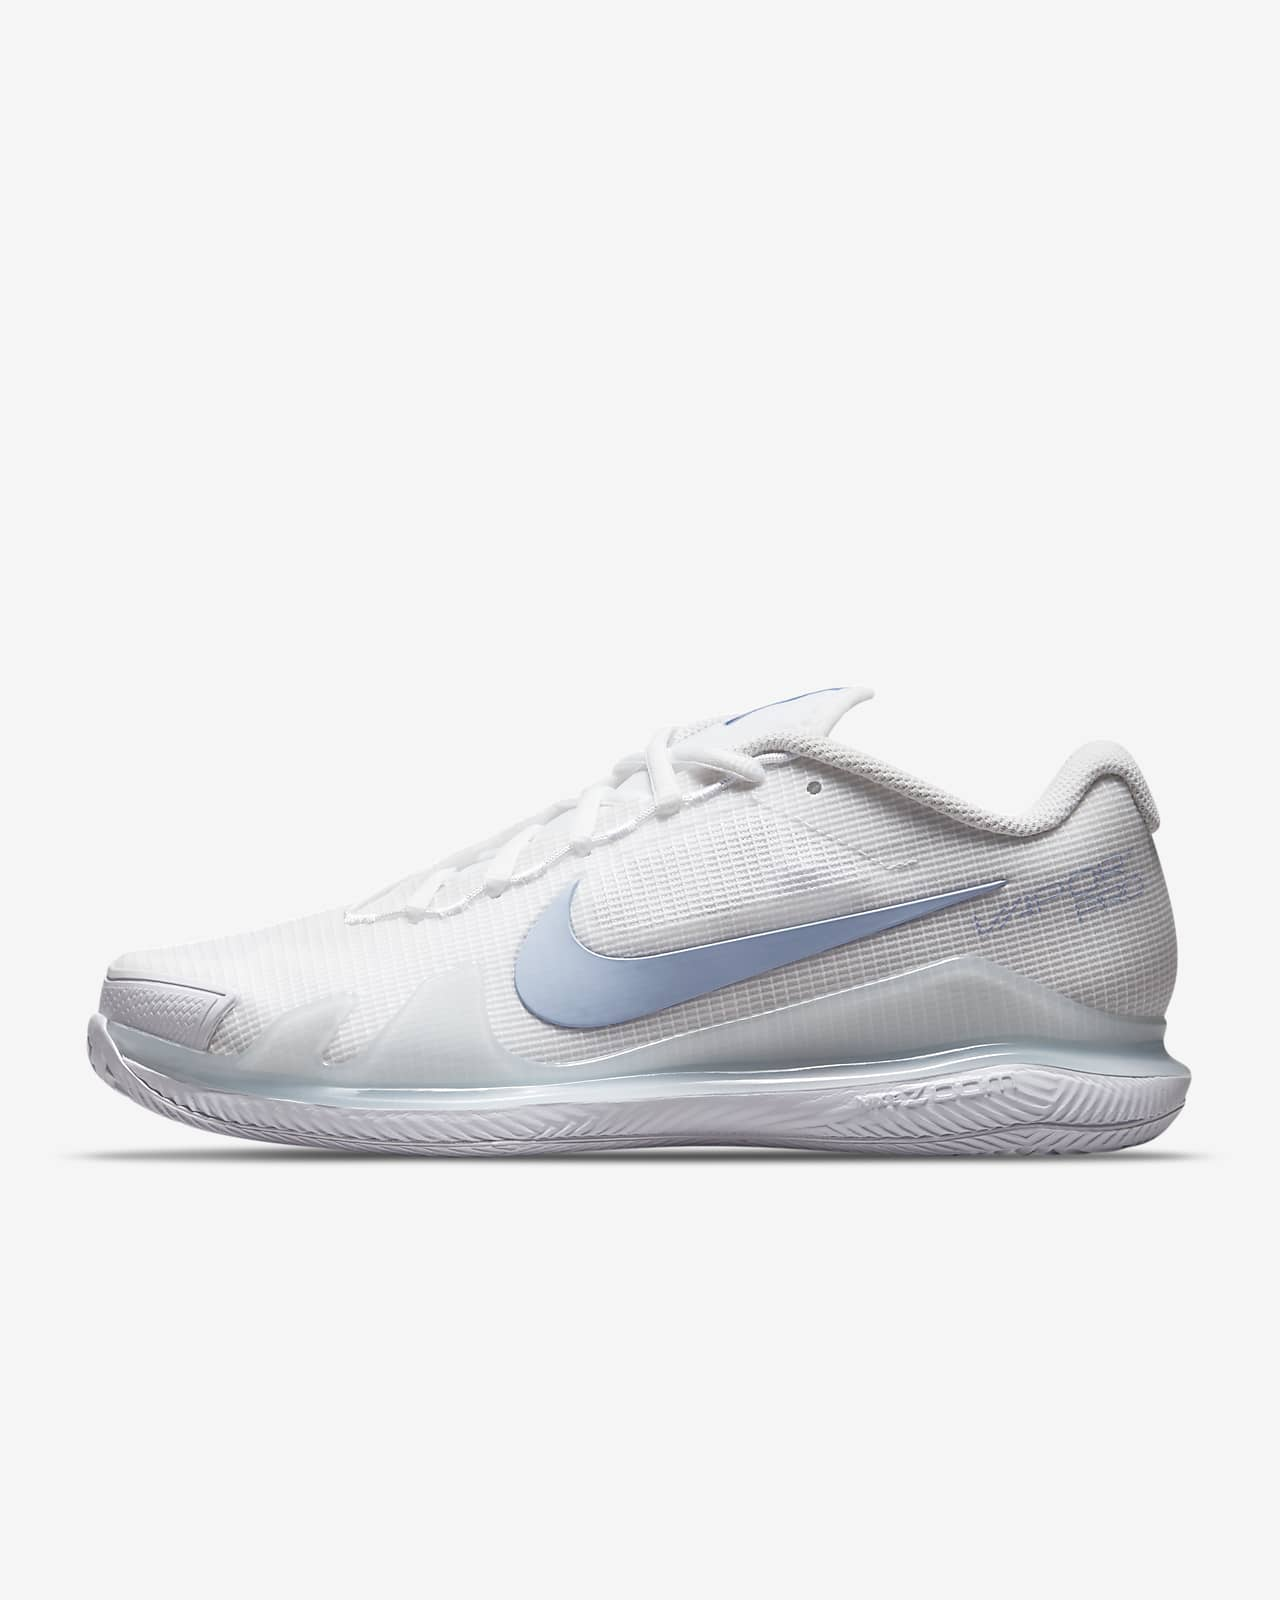 NikeCourt Air Zoom Vapor Pro Women's Clay Court Tennis Shoe